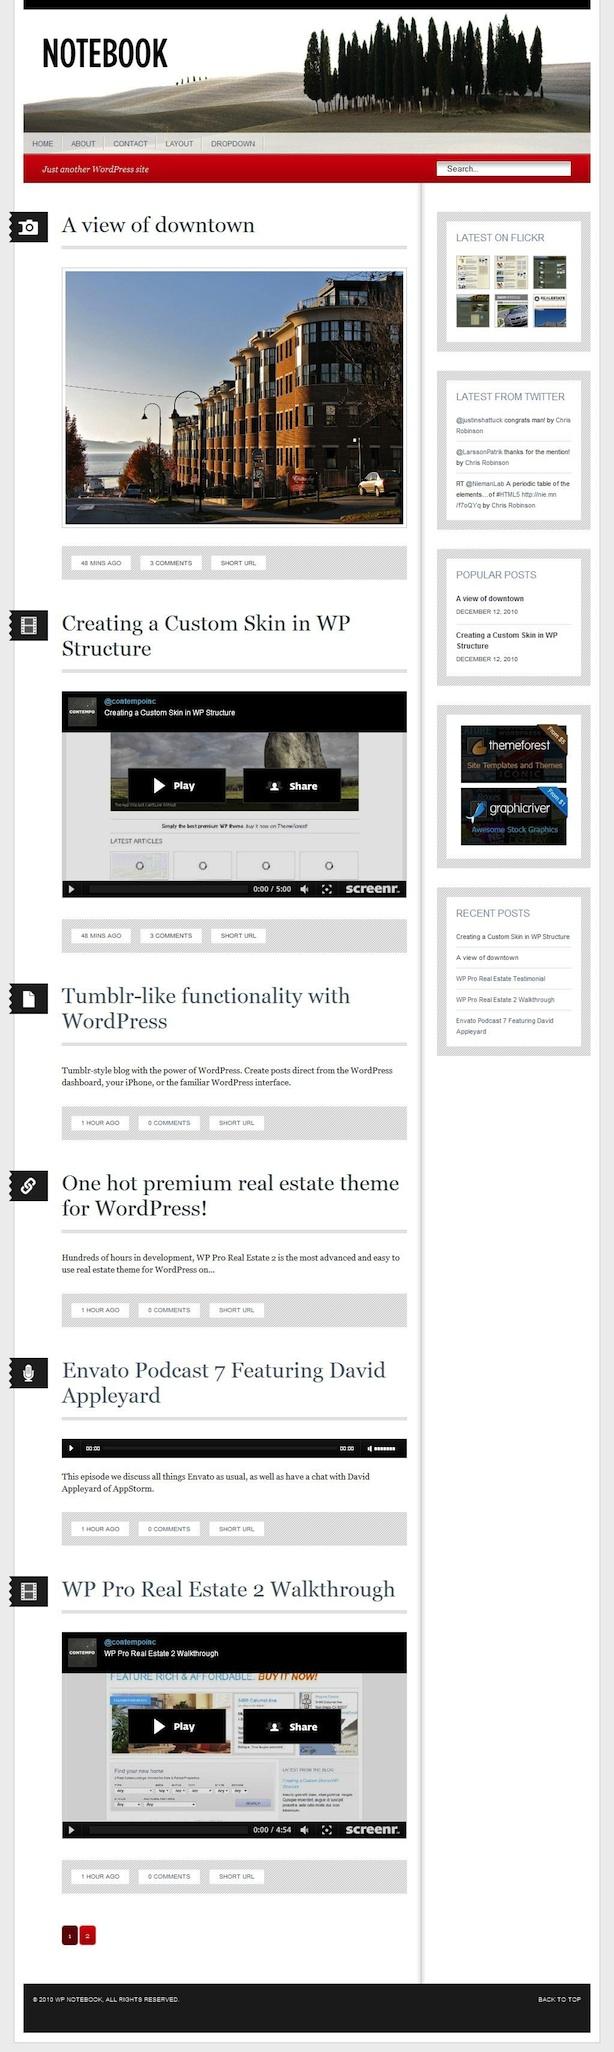 Tumblog WordPress Theme - Notebook